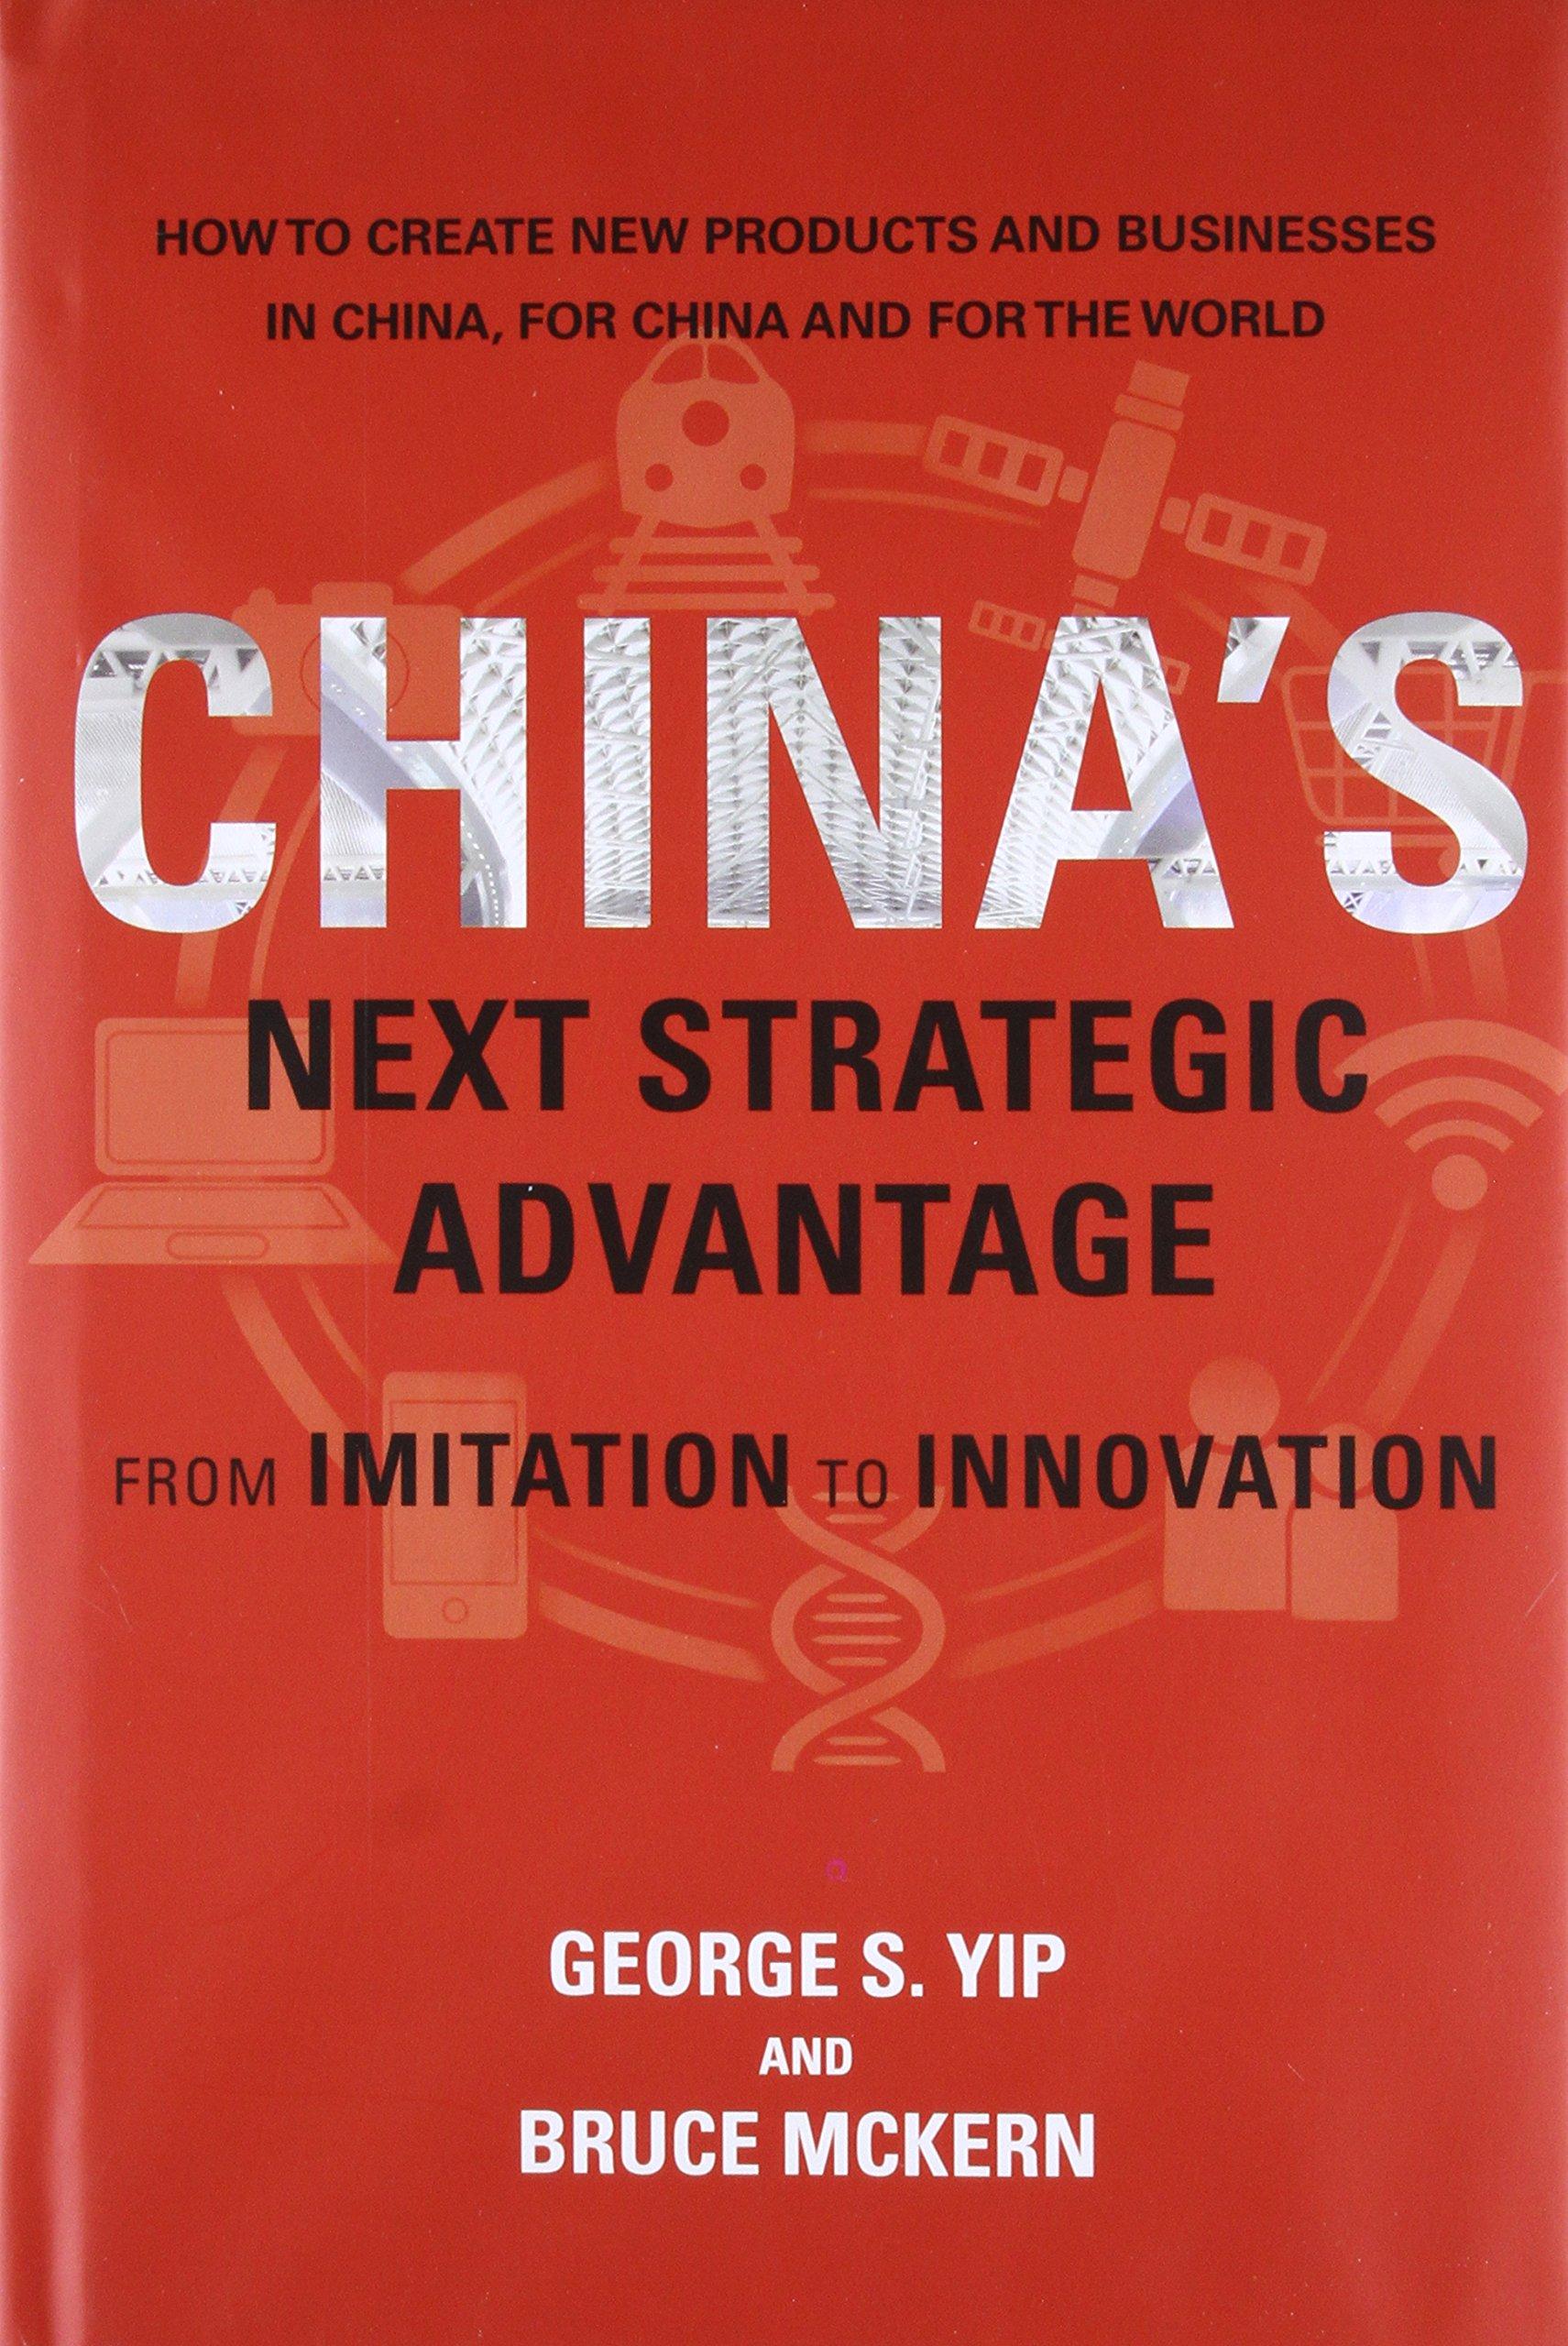 Chinas Disruptors Pdf